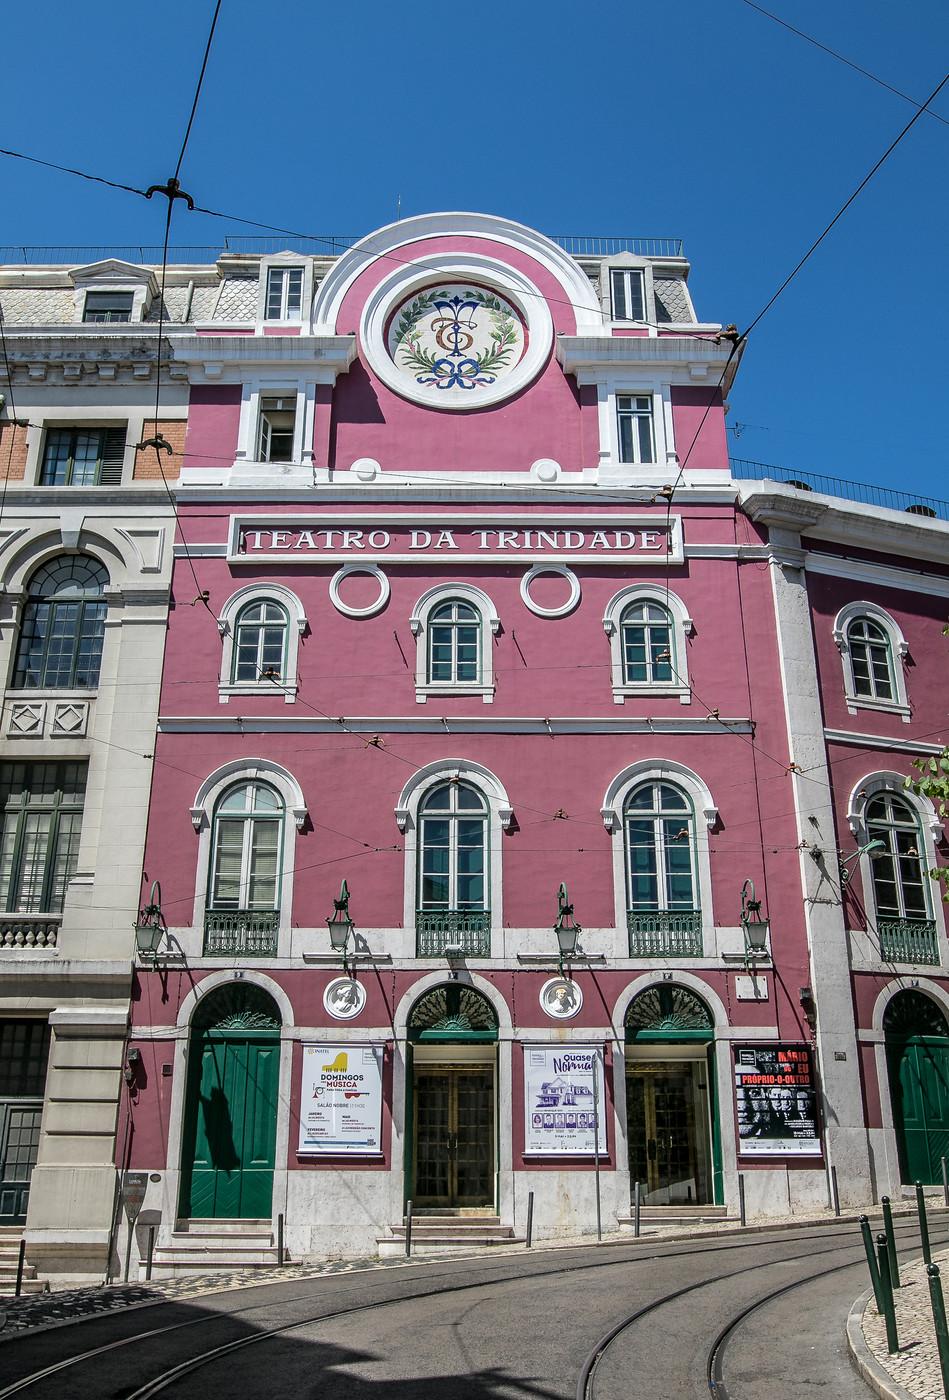 Tridada Theater